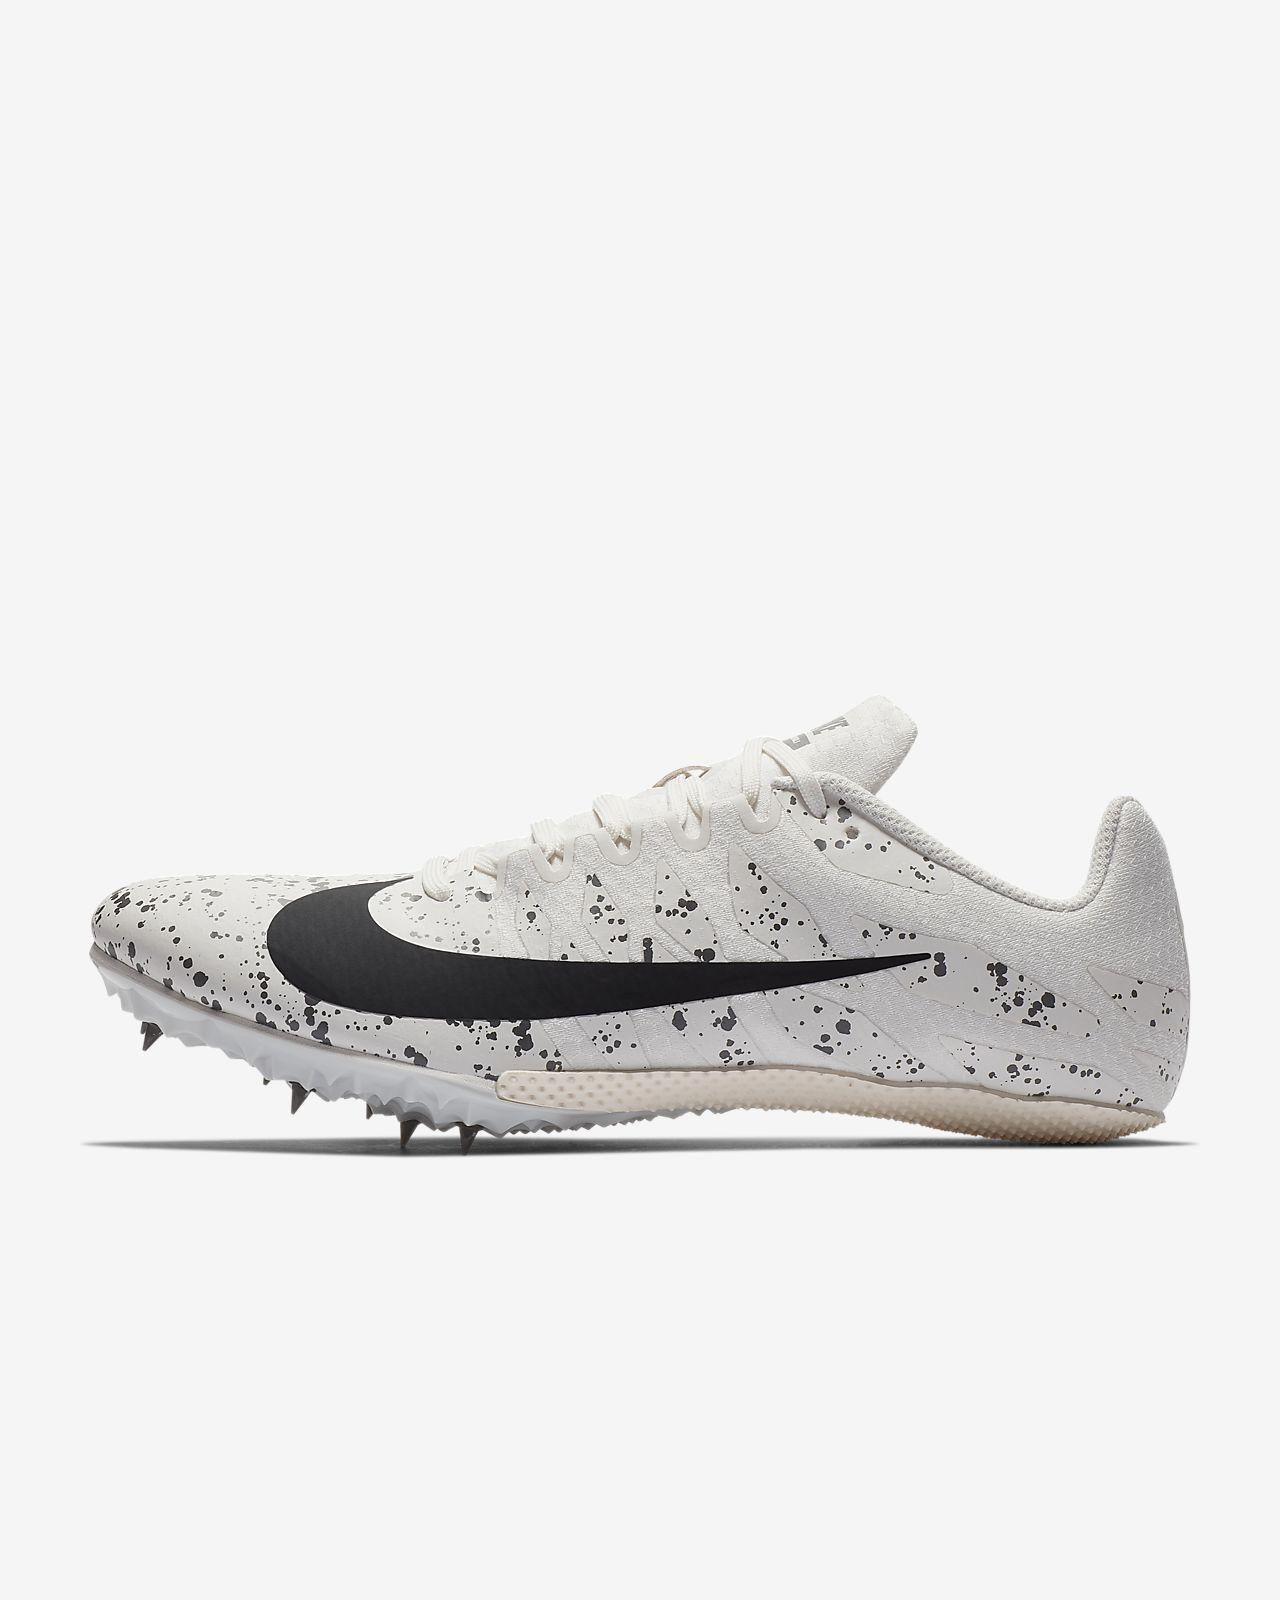 new product 8c601 0b726 ... Chaussure de course à pointes mixte Nike Zoom Rival S 9